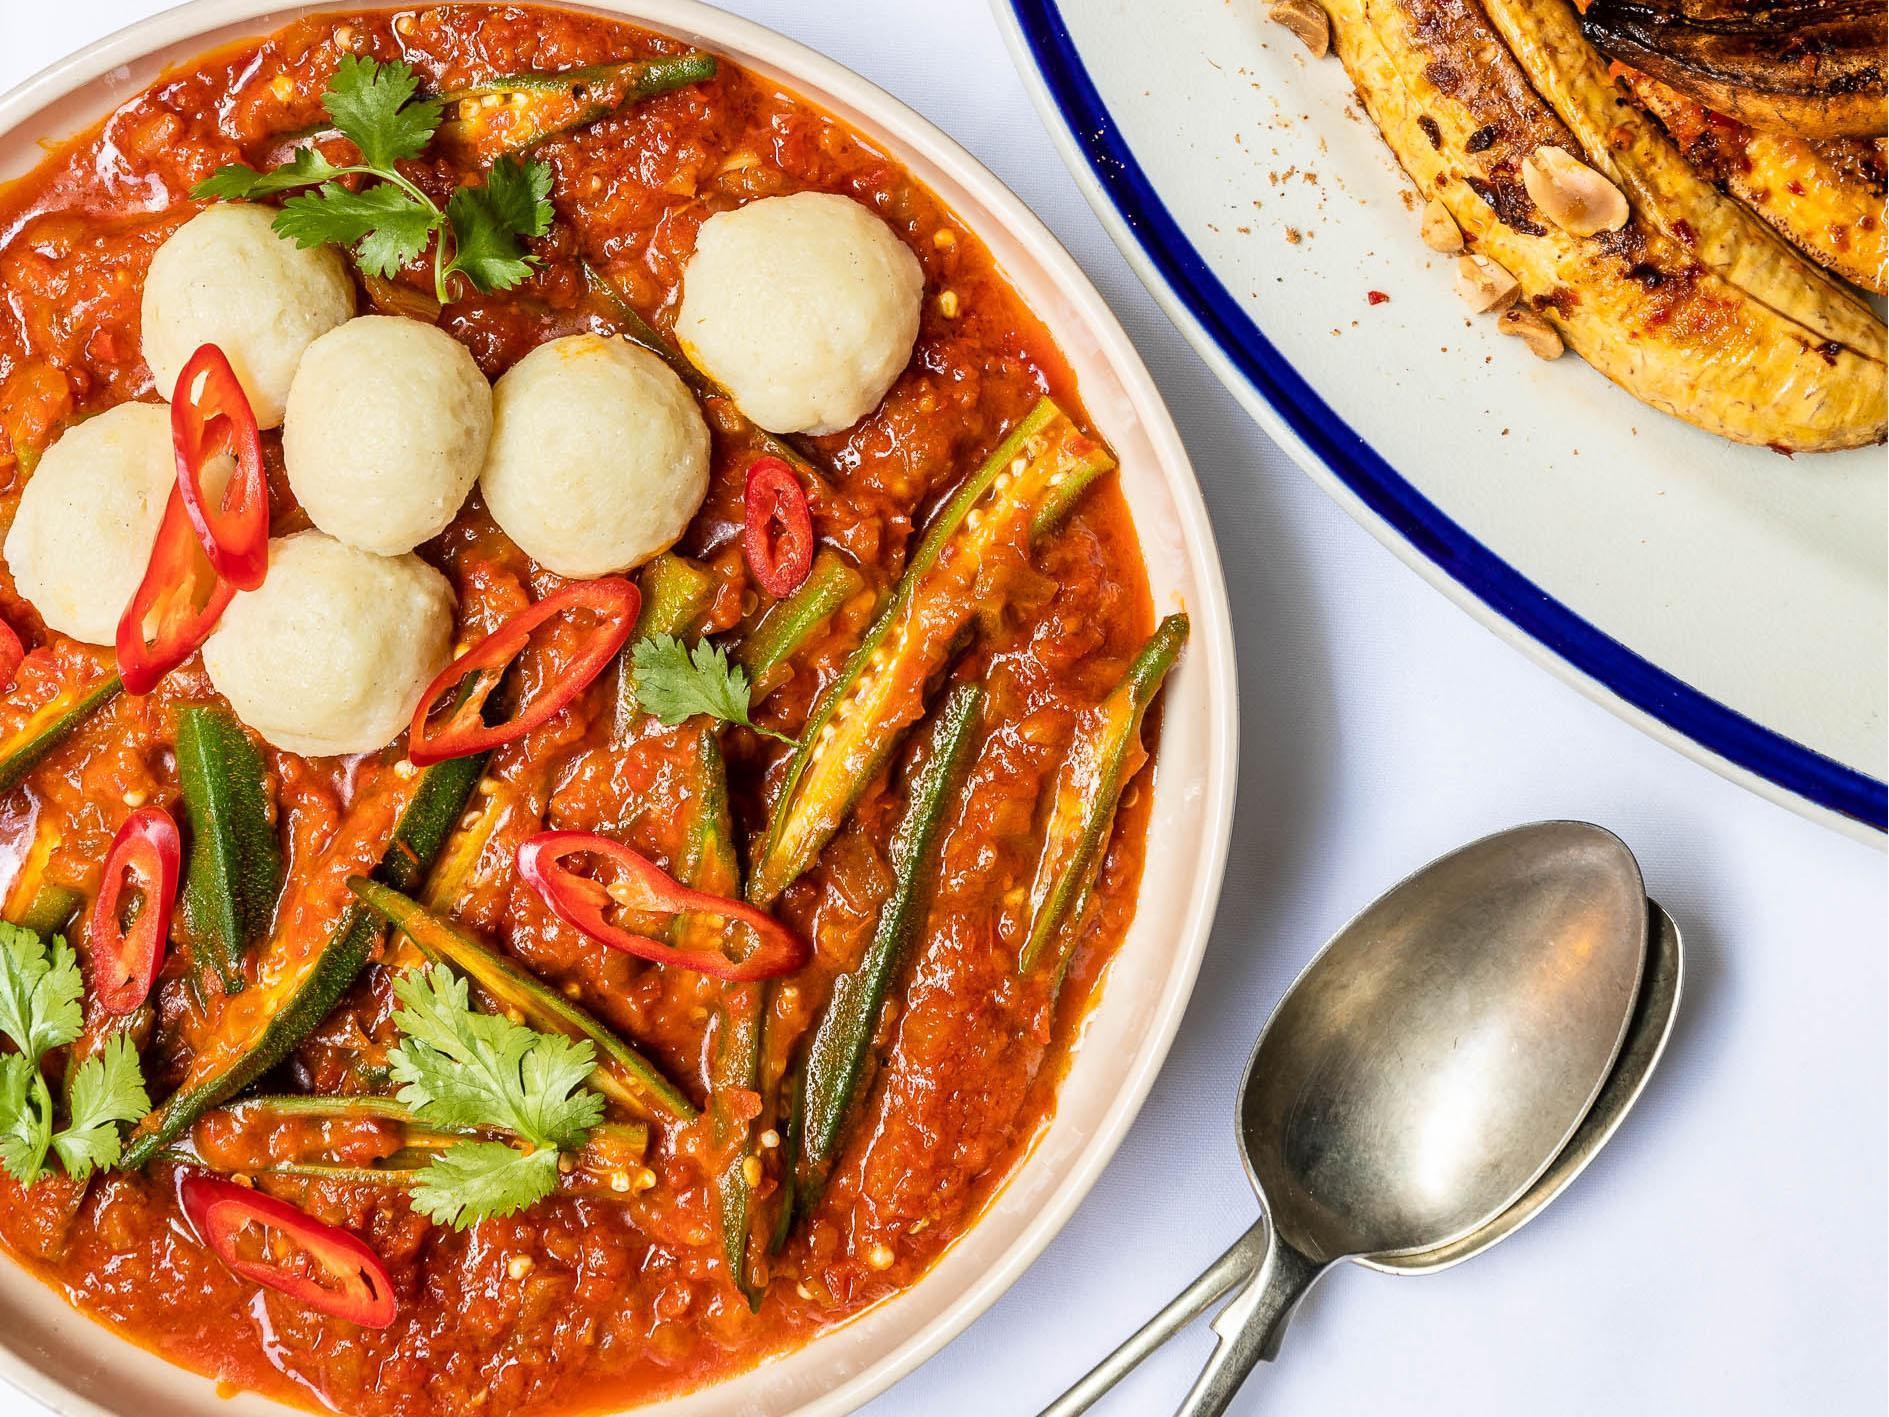 How to make Ghanaian okra stew 1